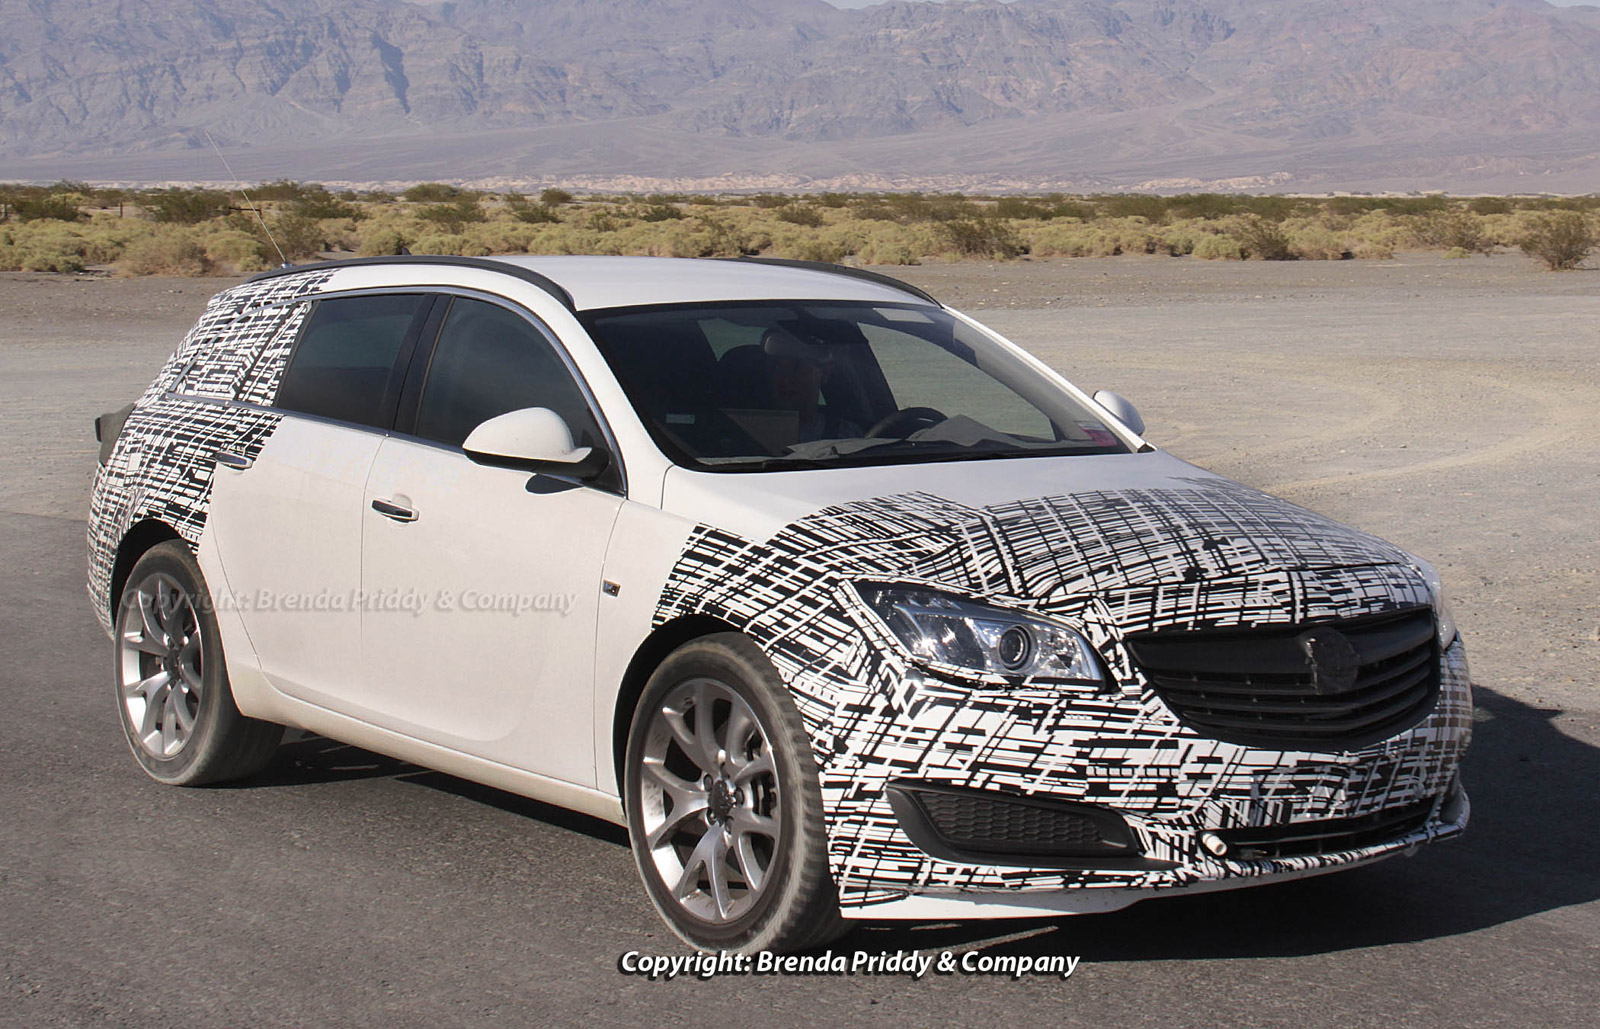 2014 Buick Regal Sport Wagon spy shots